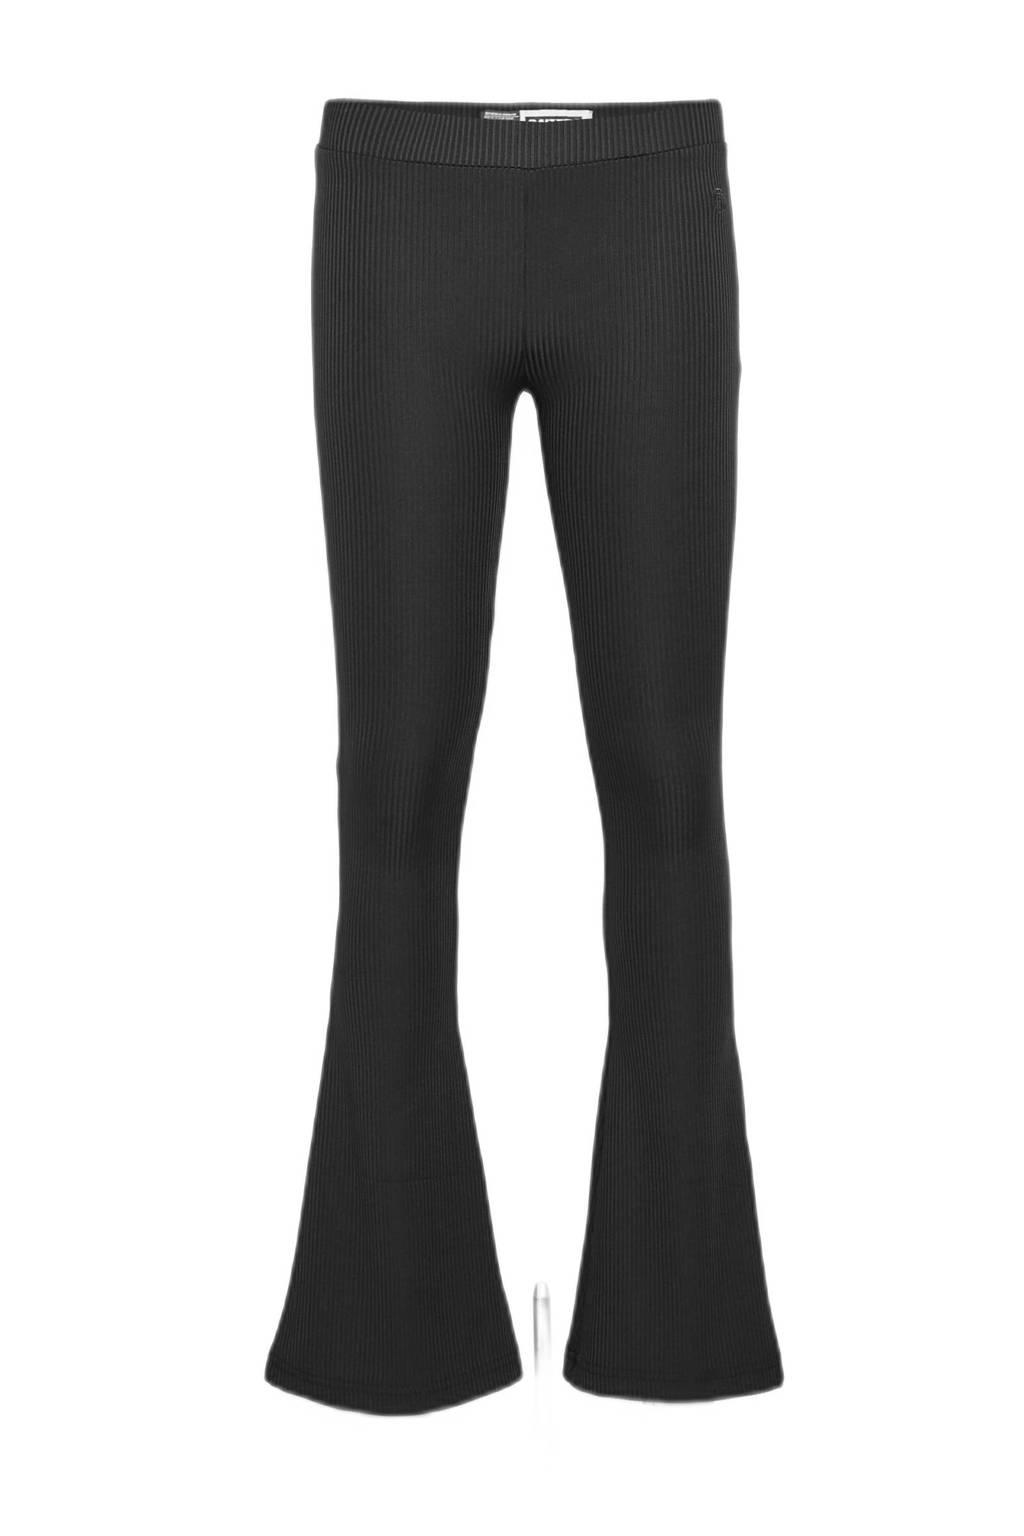 Raizzed flared broek Porto zwart, Zwart